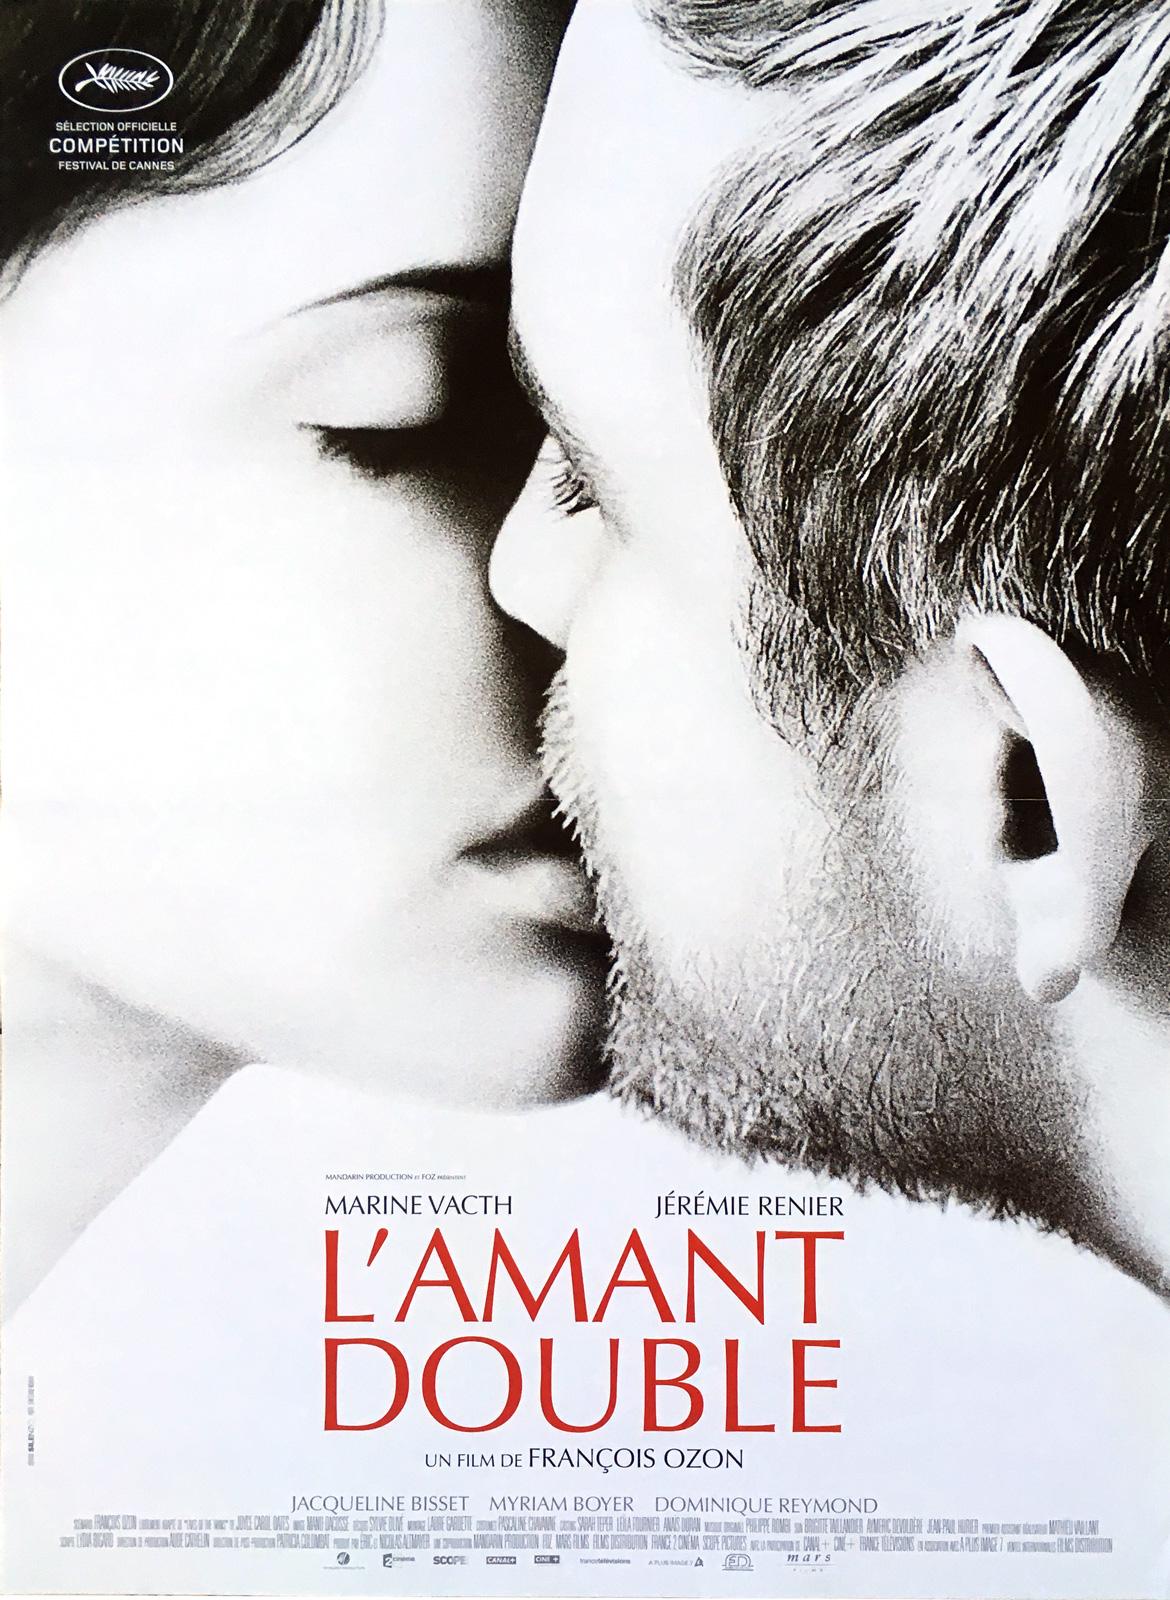 amant-double-movie-poster-15x21-in-2017-françois-ozon-jacqueline-bisset.jpg